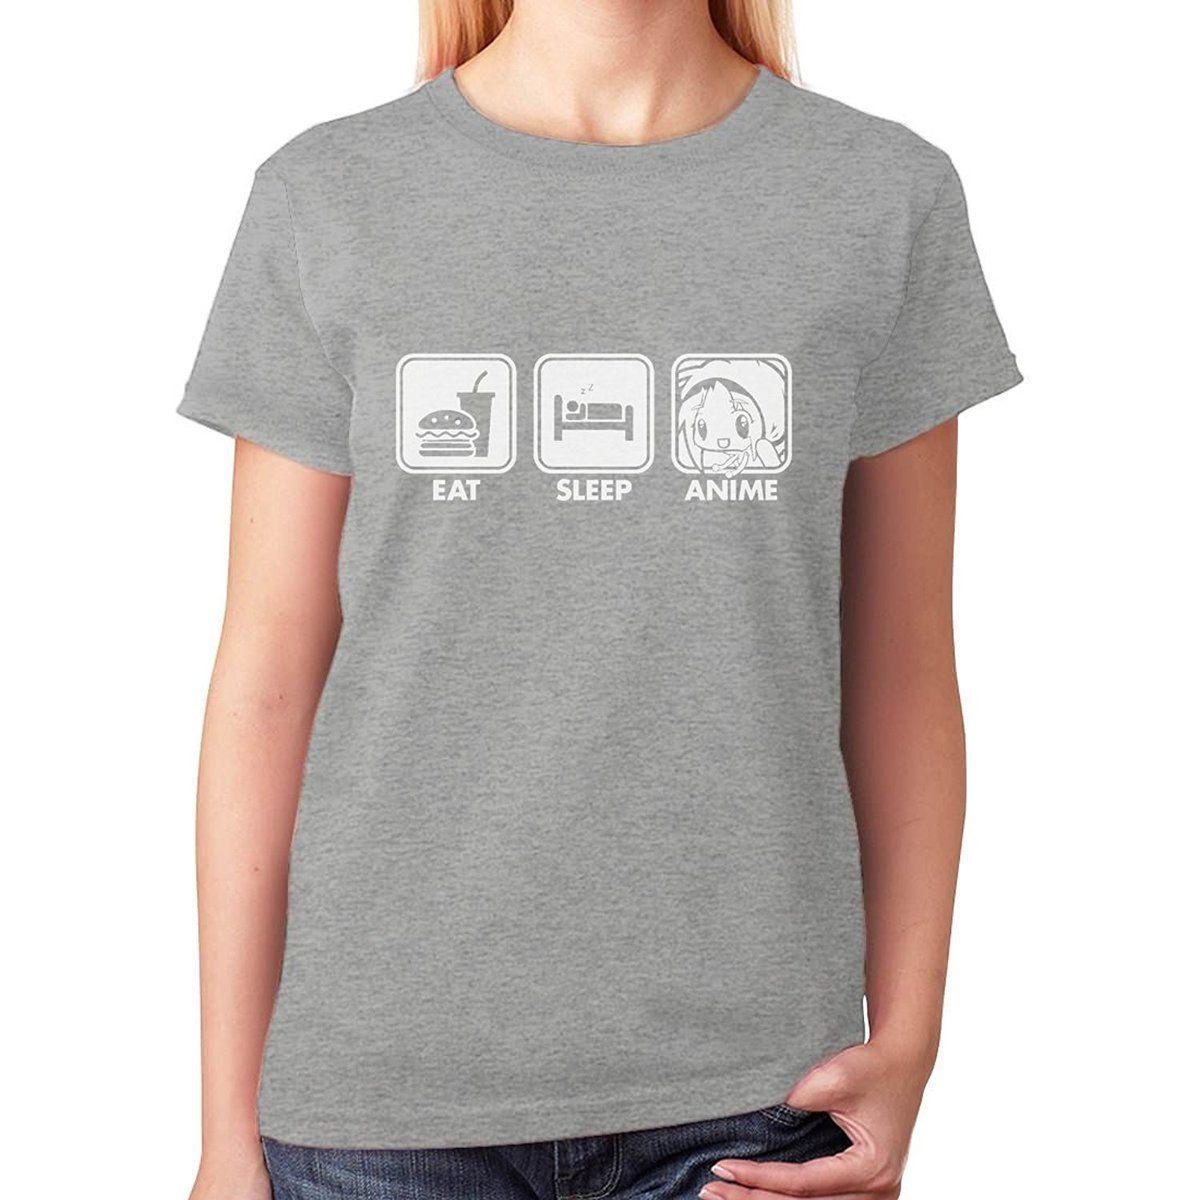 Print Logo On Shirt Womens Eat Sleep Anime Short Sleeve Fashion